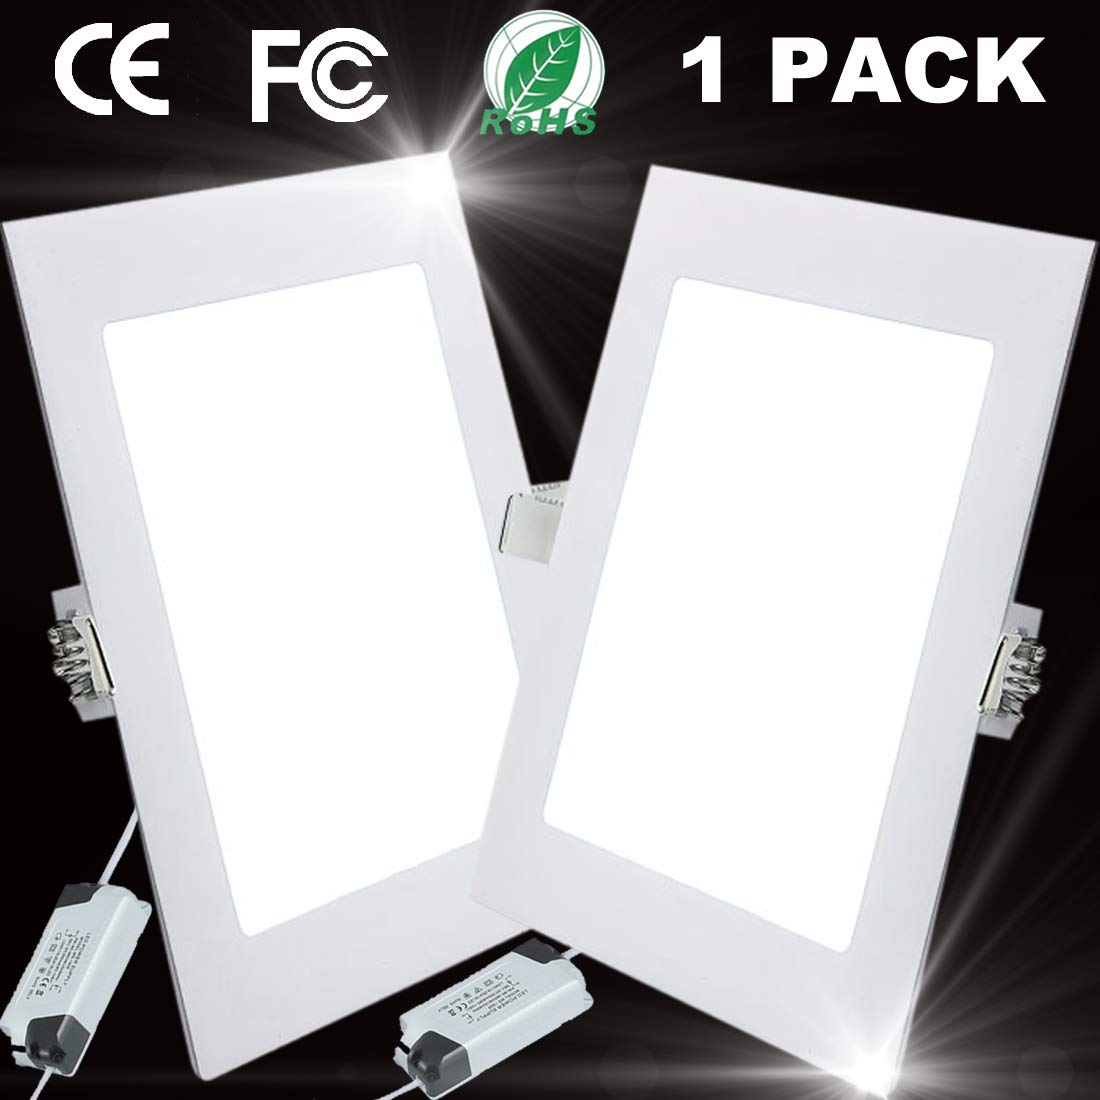 12W Luz de Techo Empotrada LED Cuadrados Panel de Luz Led Downlight Destacar Iluminaci/ón Cocina Ba/ño Corredor 3000K Warm White Tama/ño del Agujero 15.5CM